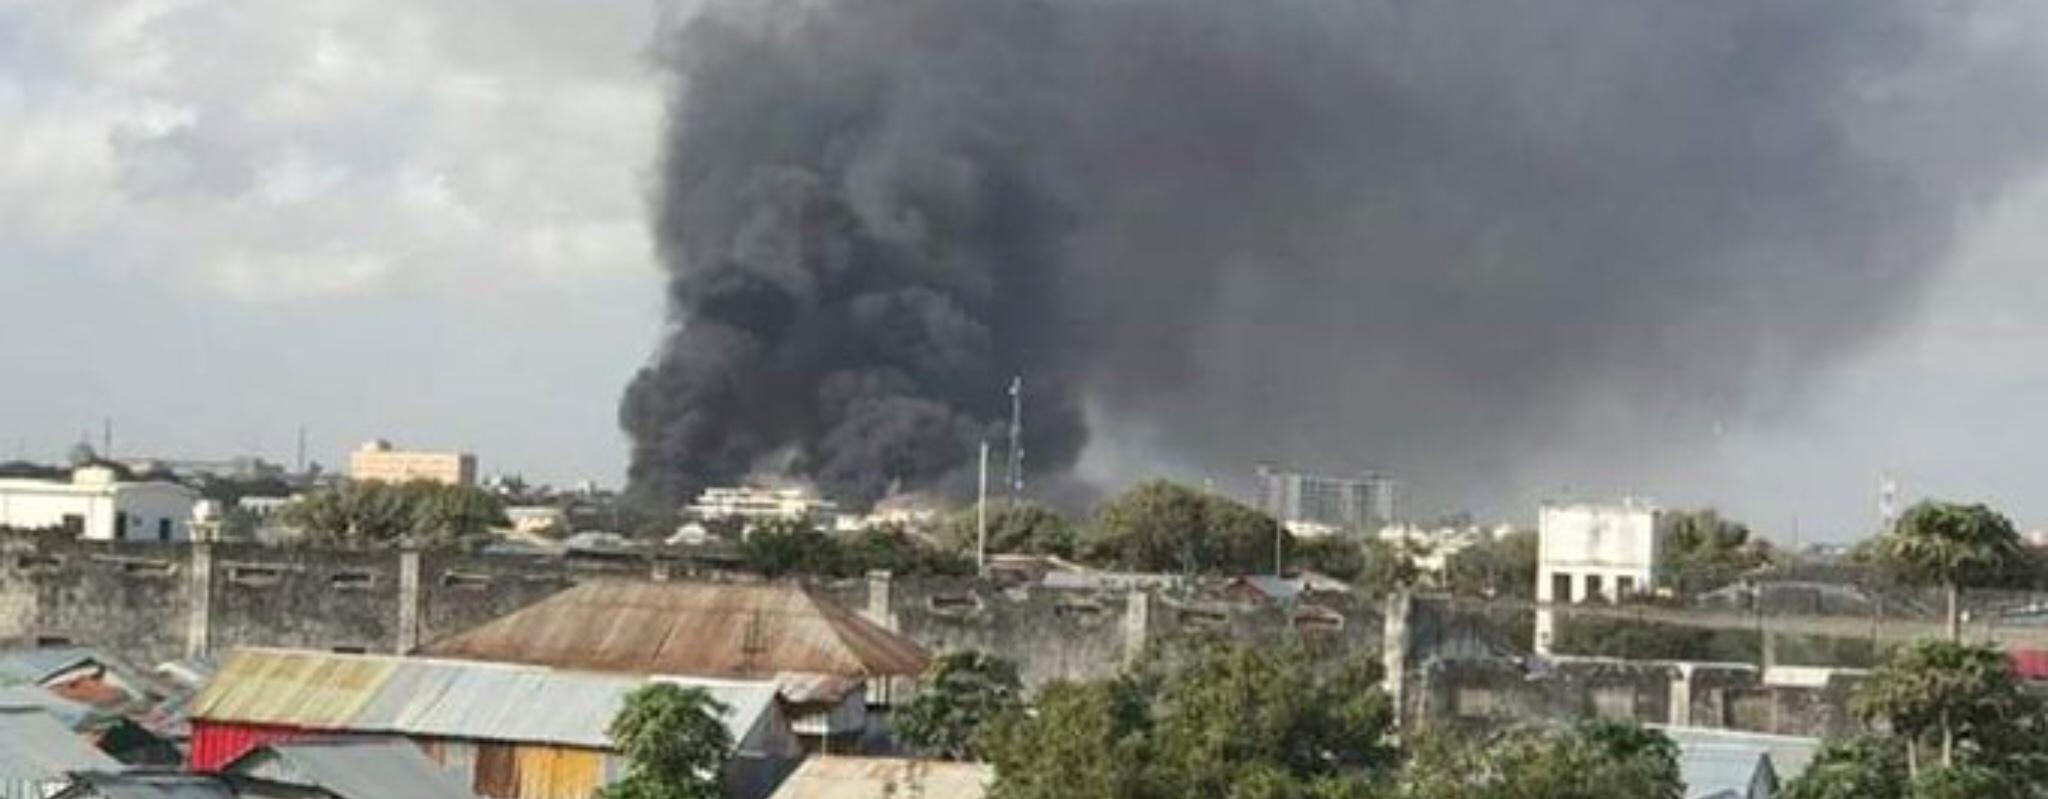 Al Shabaab attack in Mogadishu